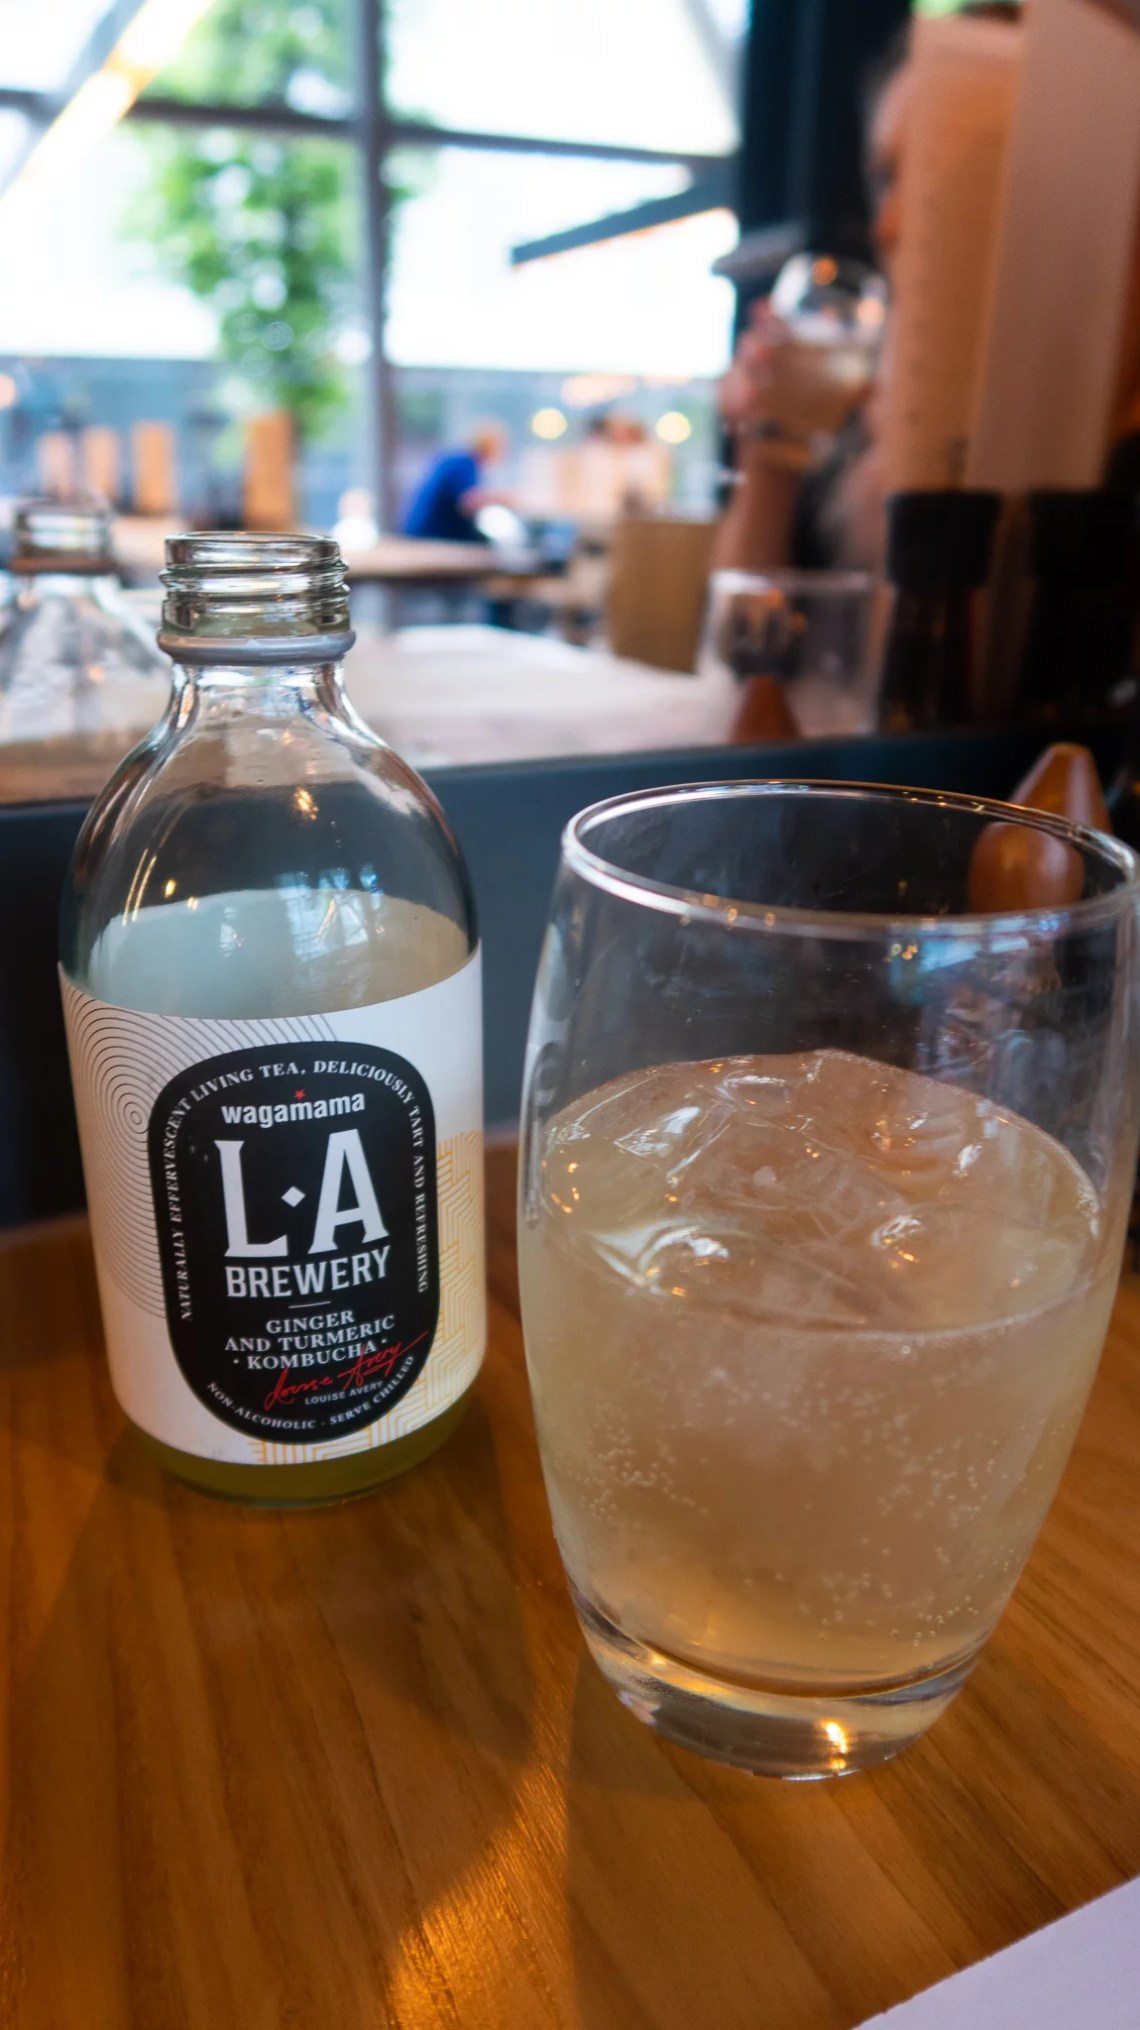 LA Brewery Ginger and Tumeric Kombucha